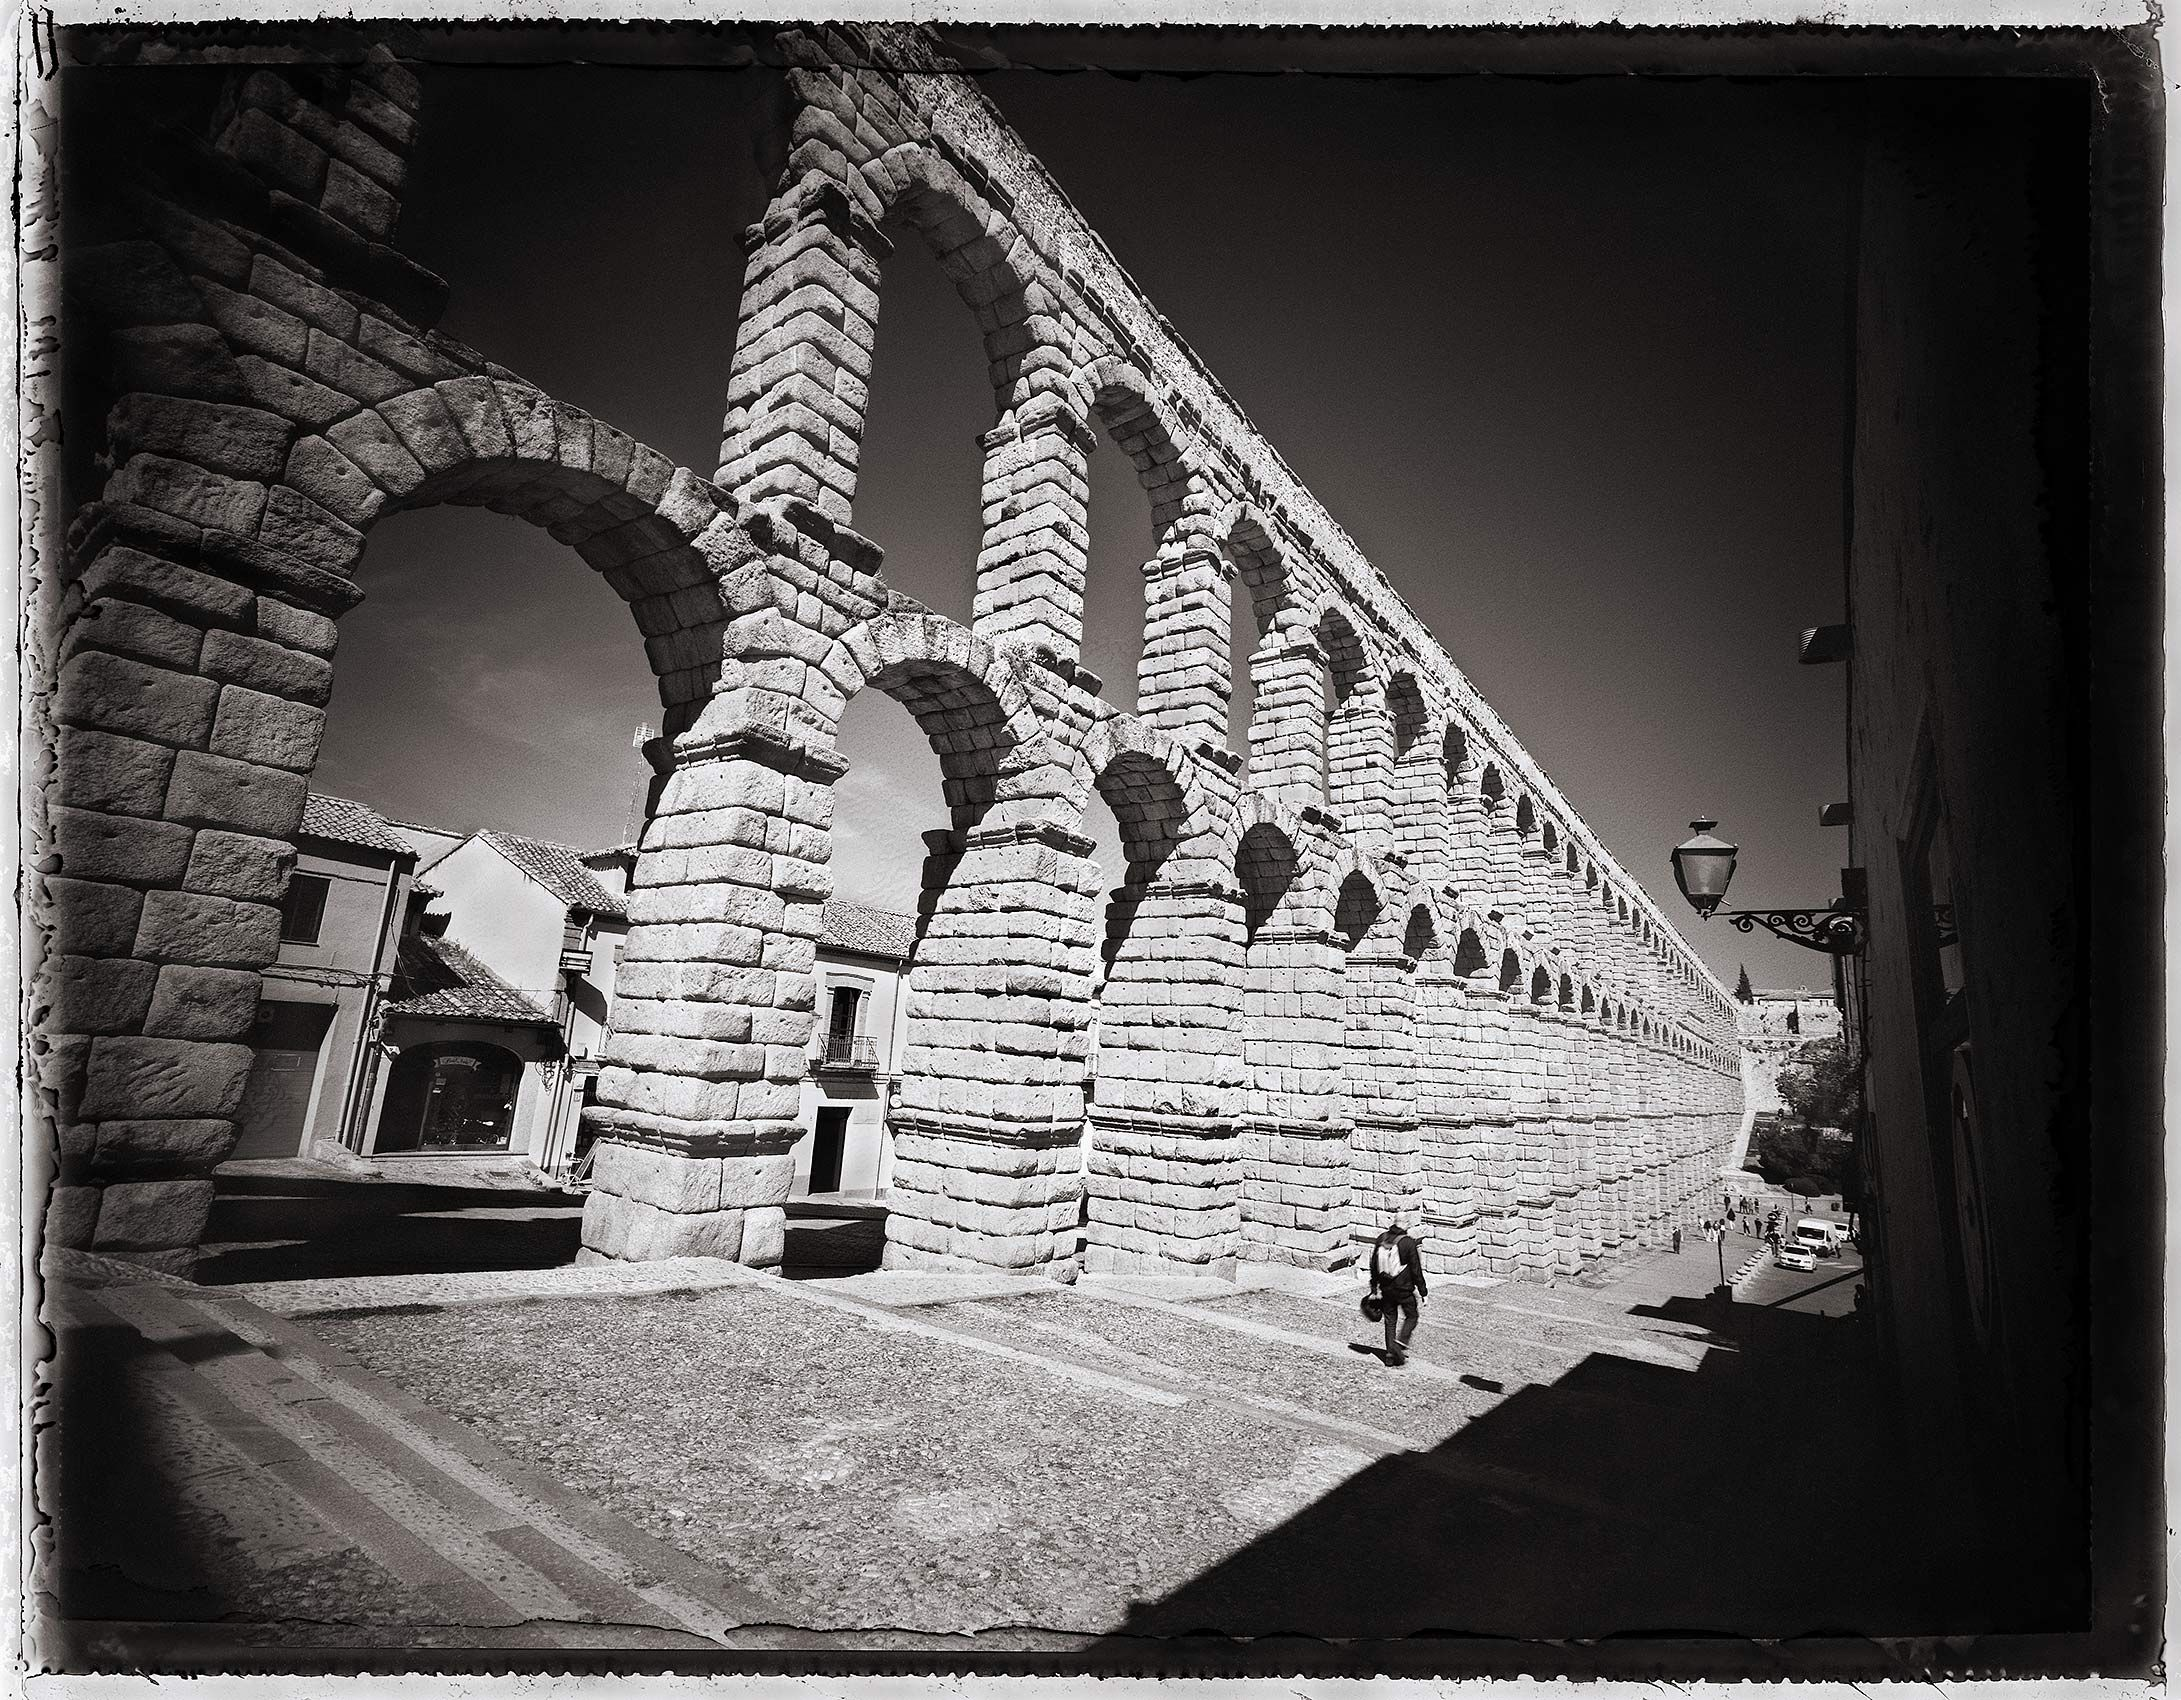 Aqueduct of Segovia #2